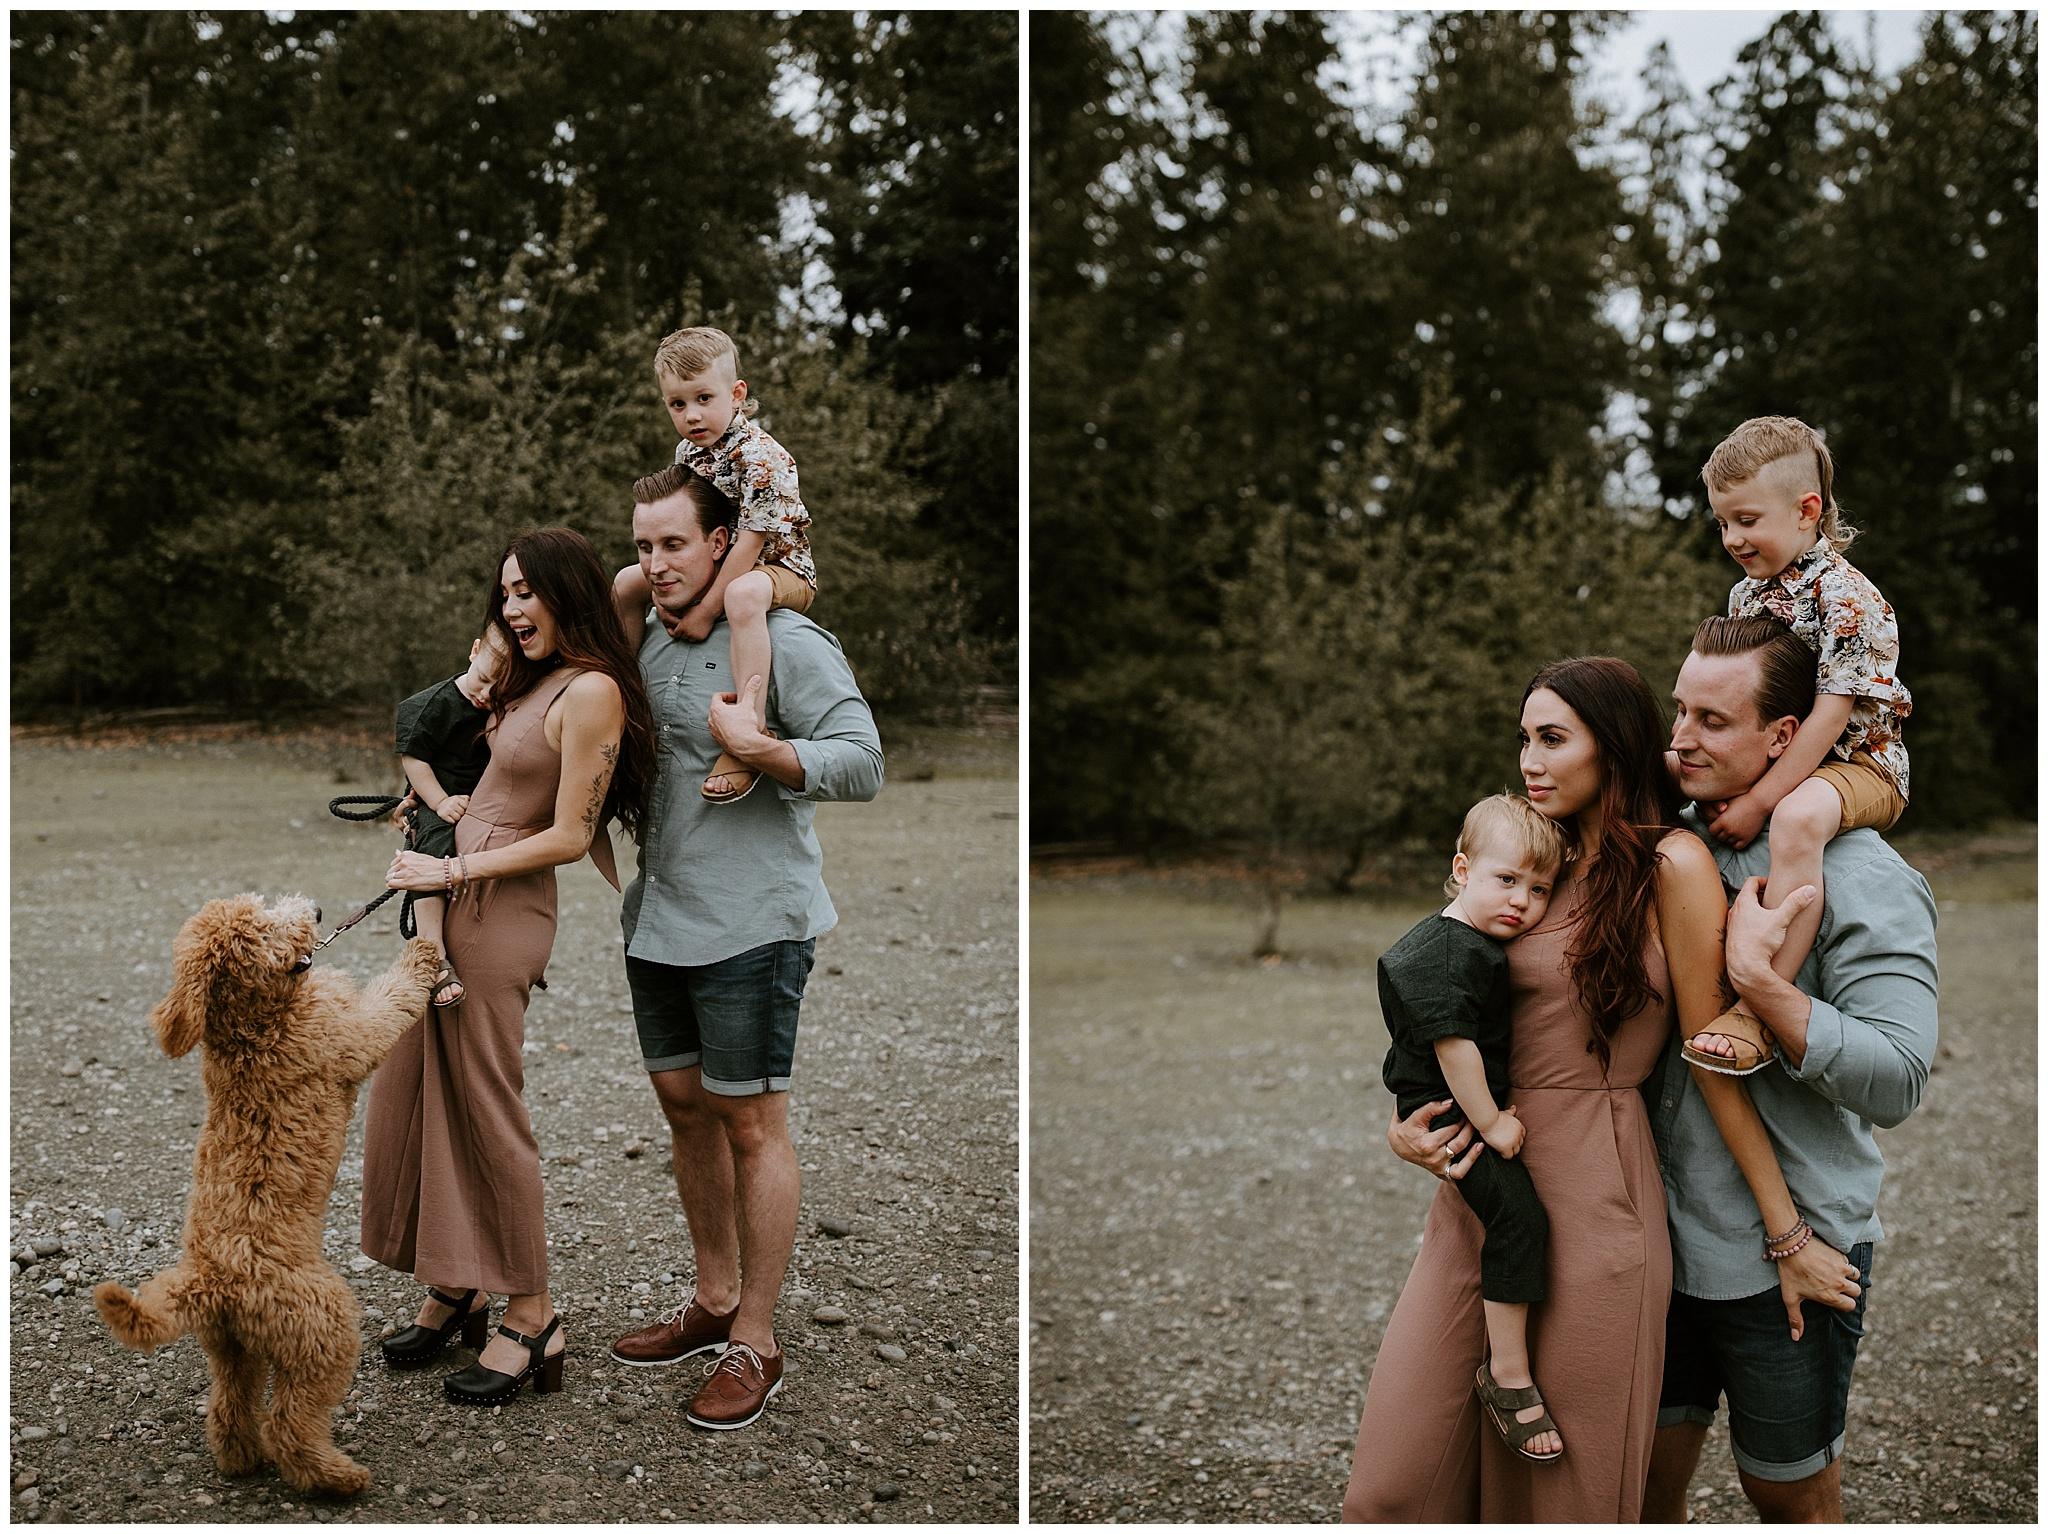 boho_family_session_vancouver_family_photographyer_007.JPG